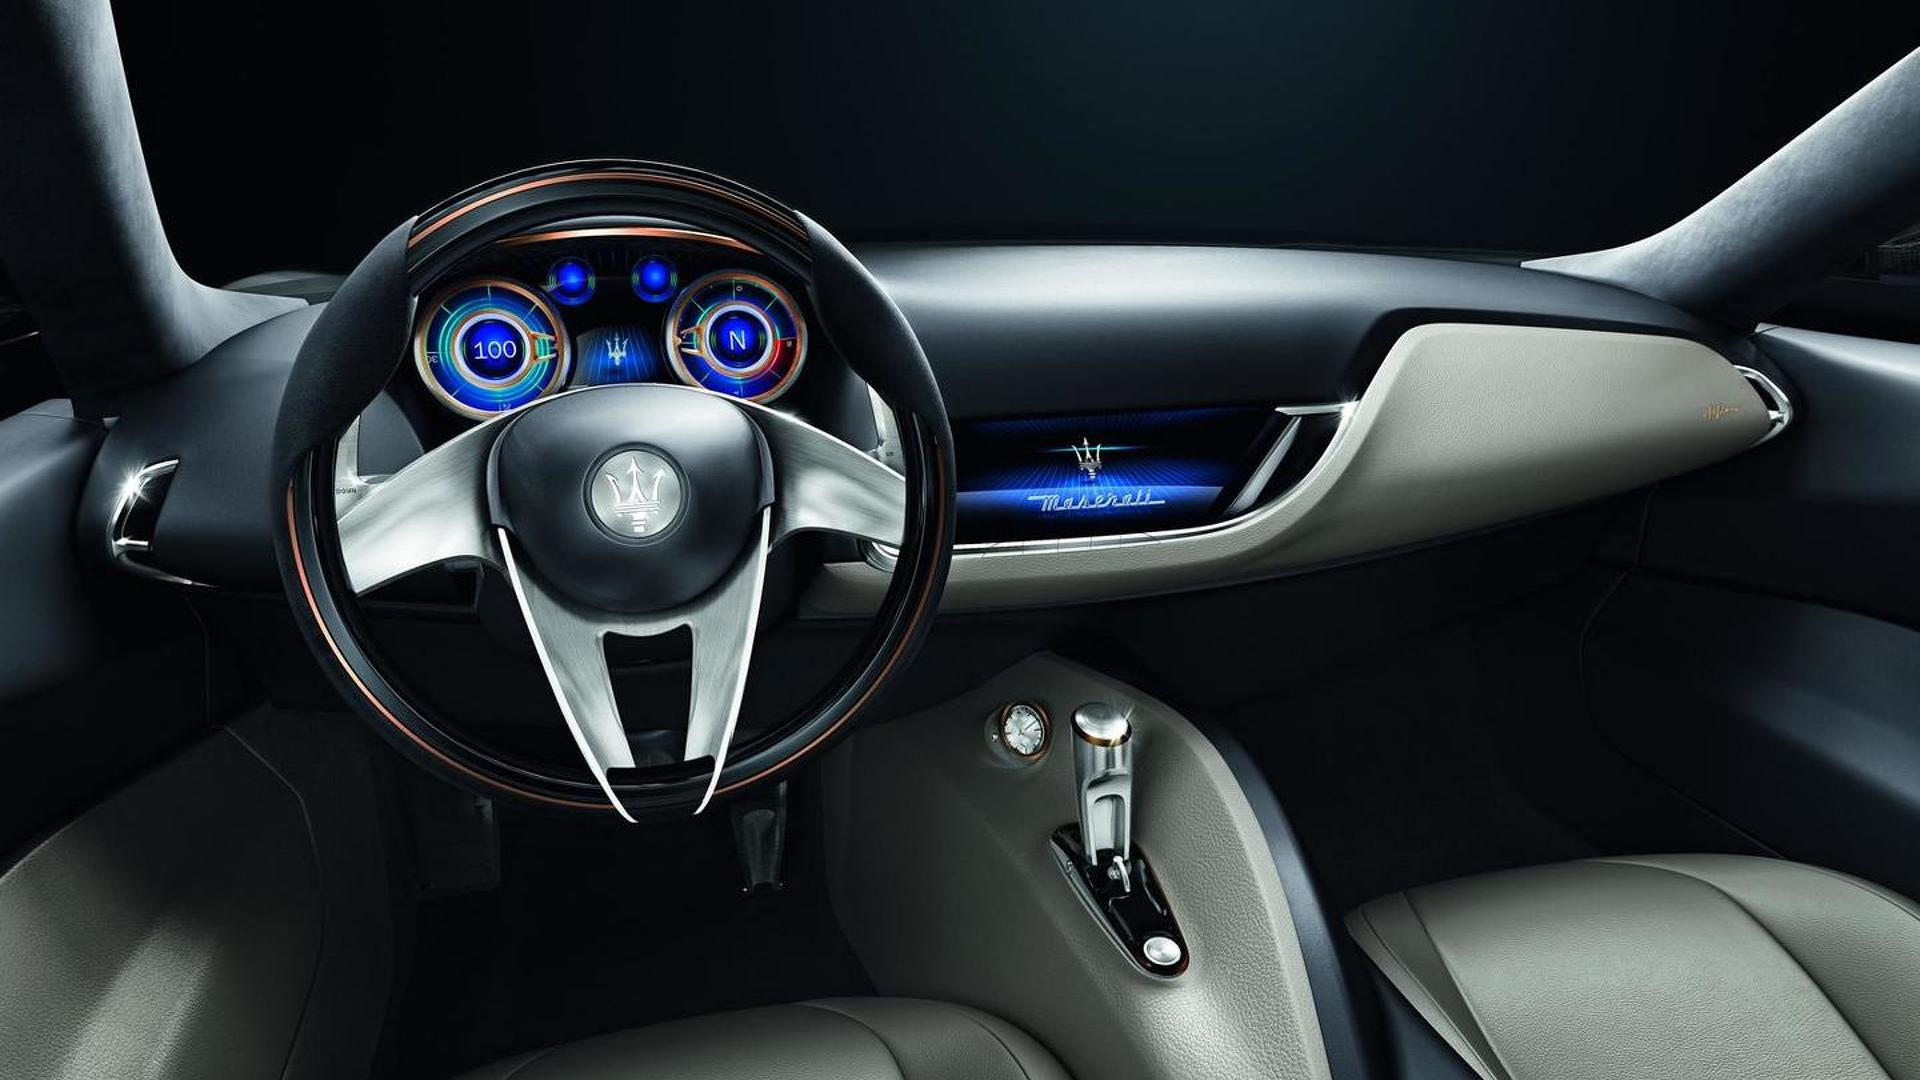 Maserati explains the design of the Alfieri concept [video]